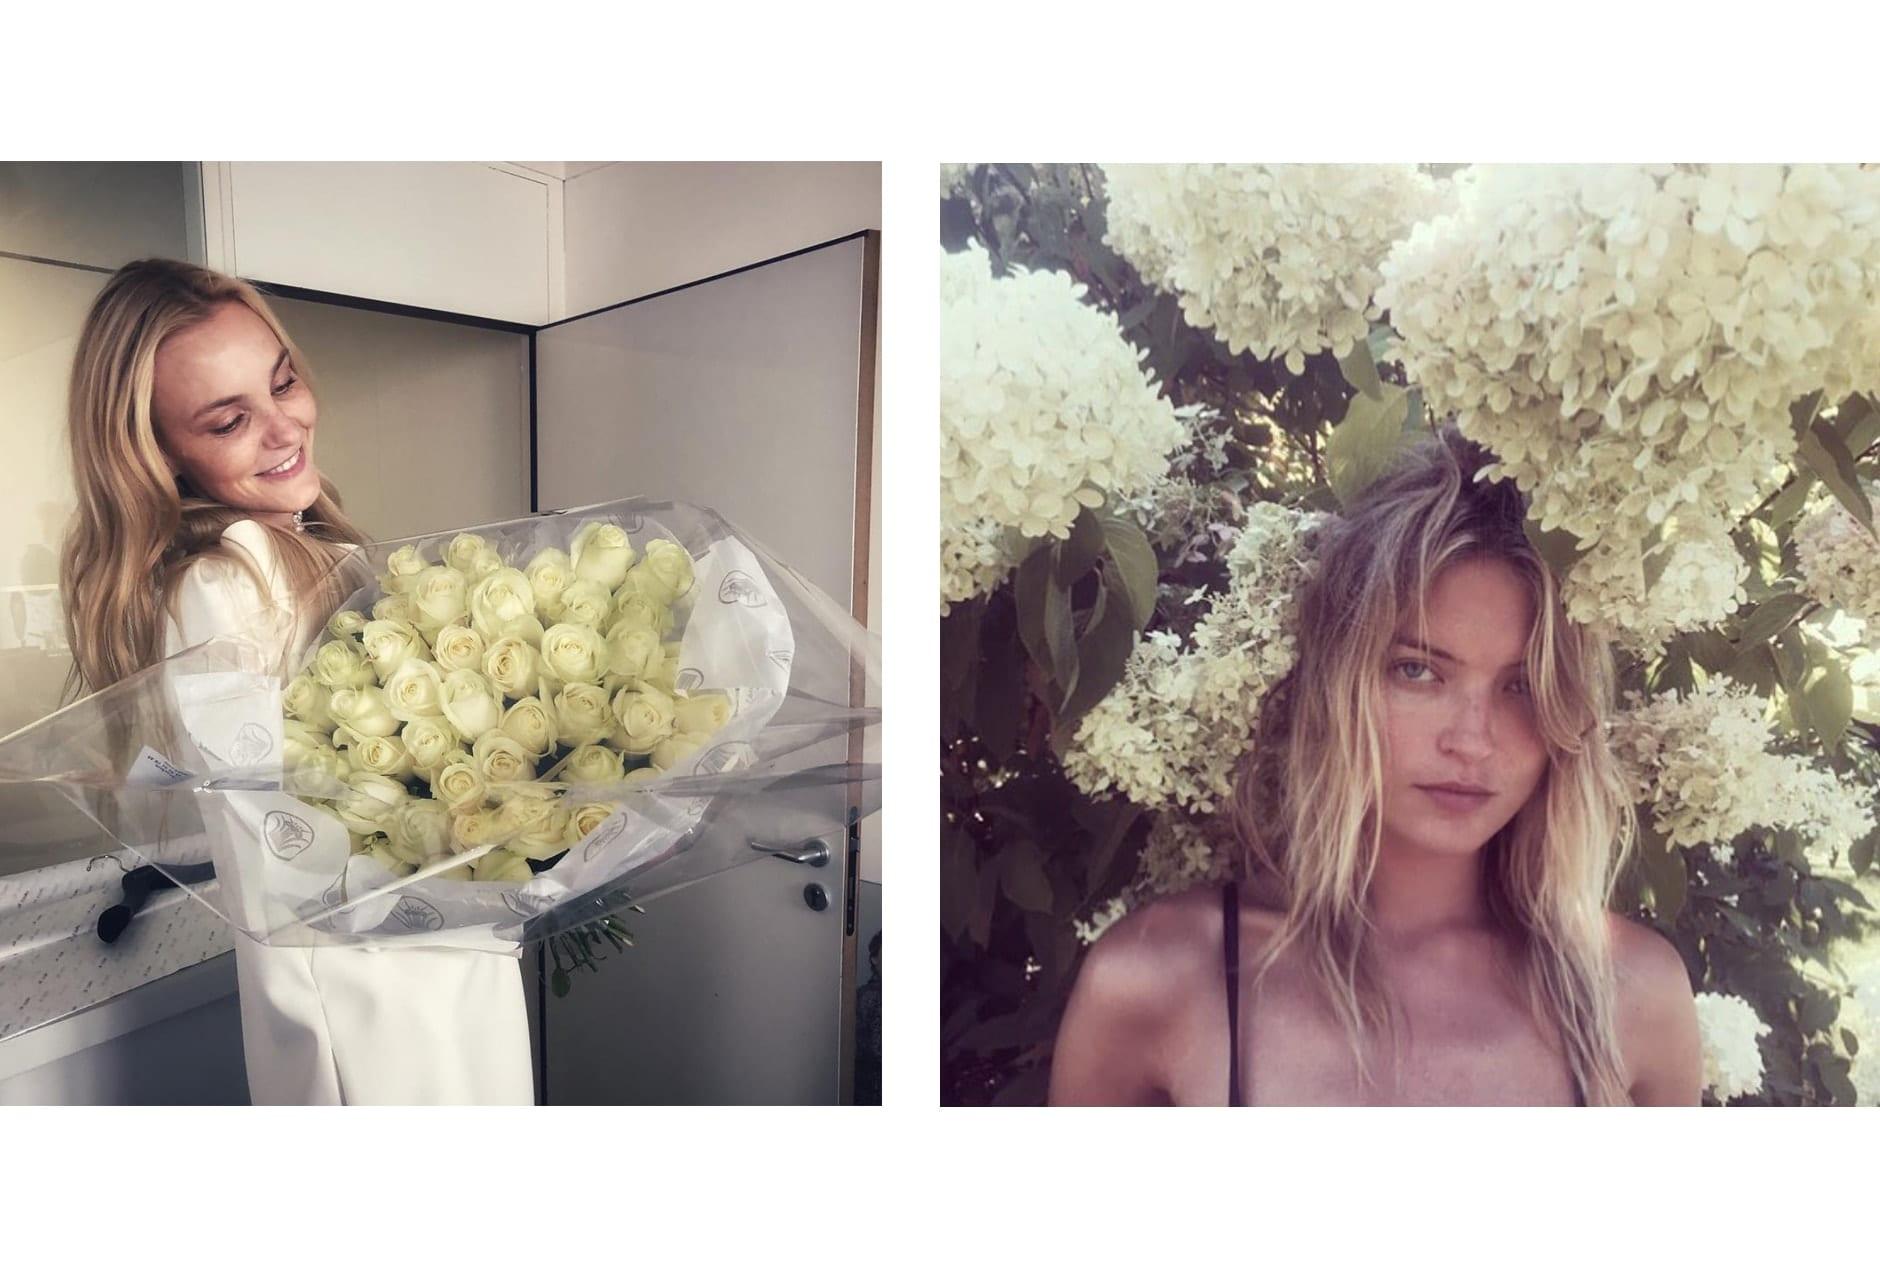 FLOWERS_carolinetrentini_marthahunt-min